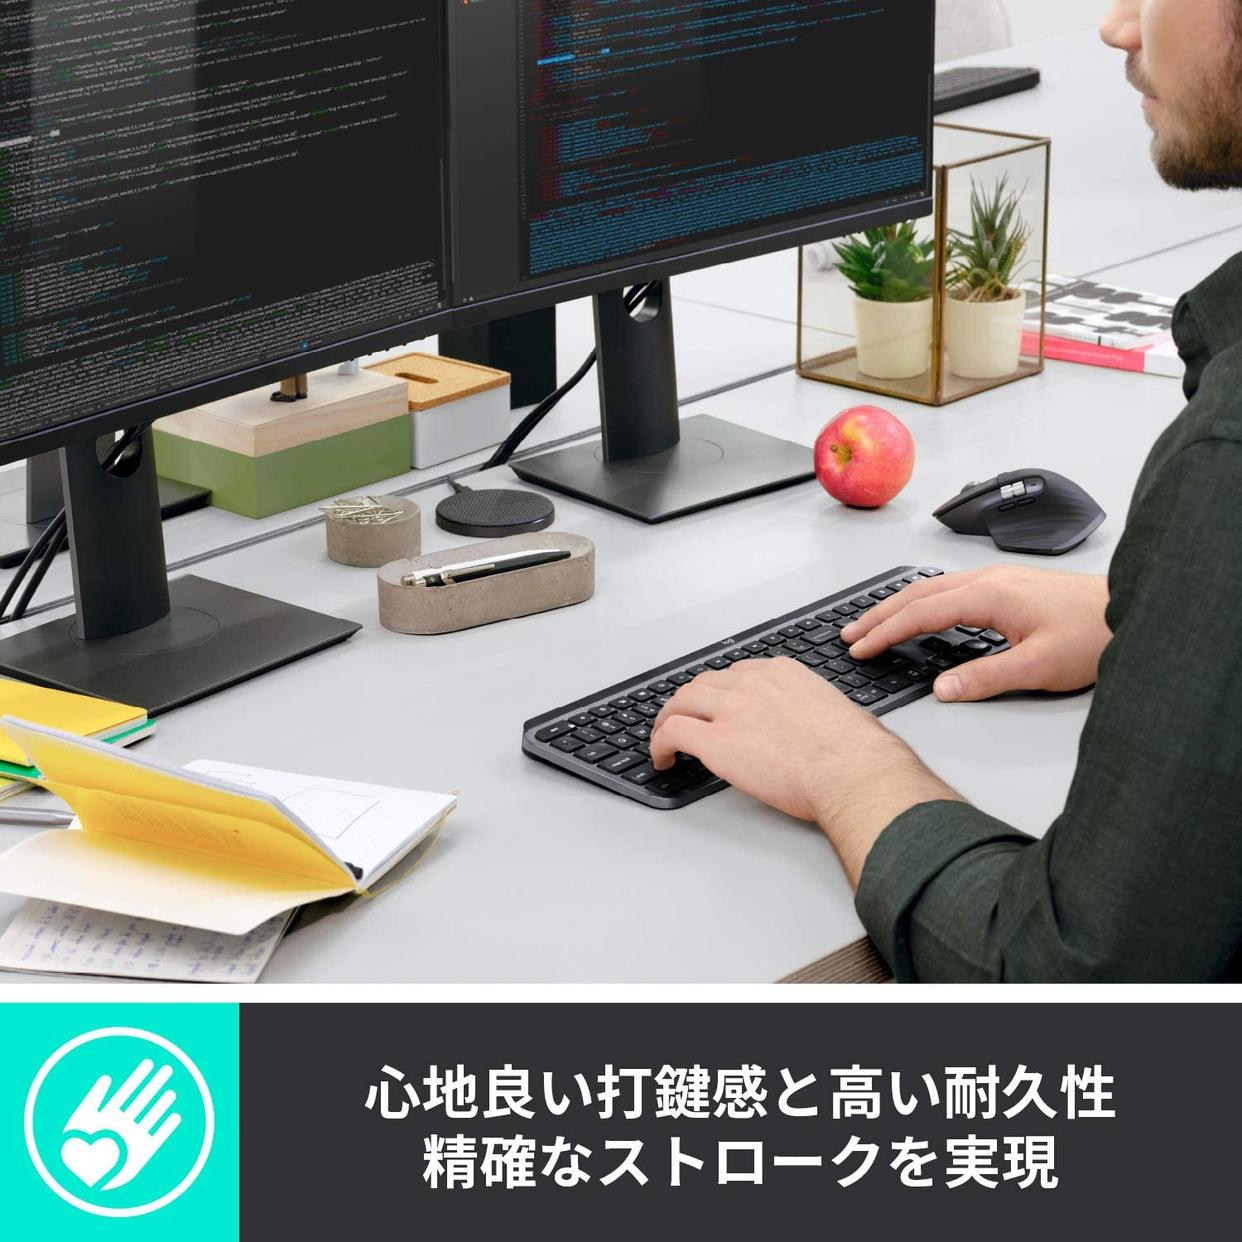 logicool(ロジクール) MX Keysキーボード KX800の商品画像3